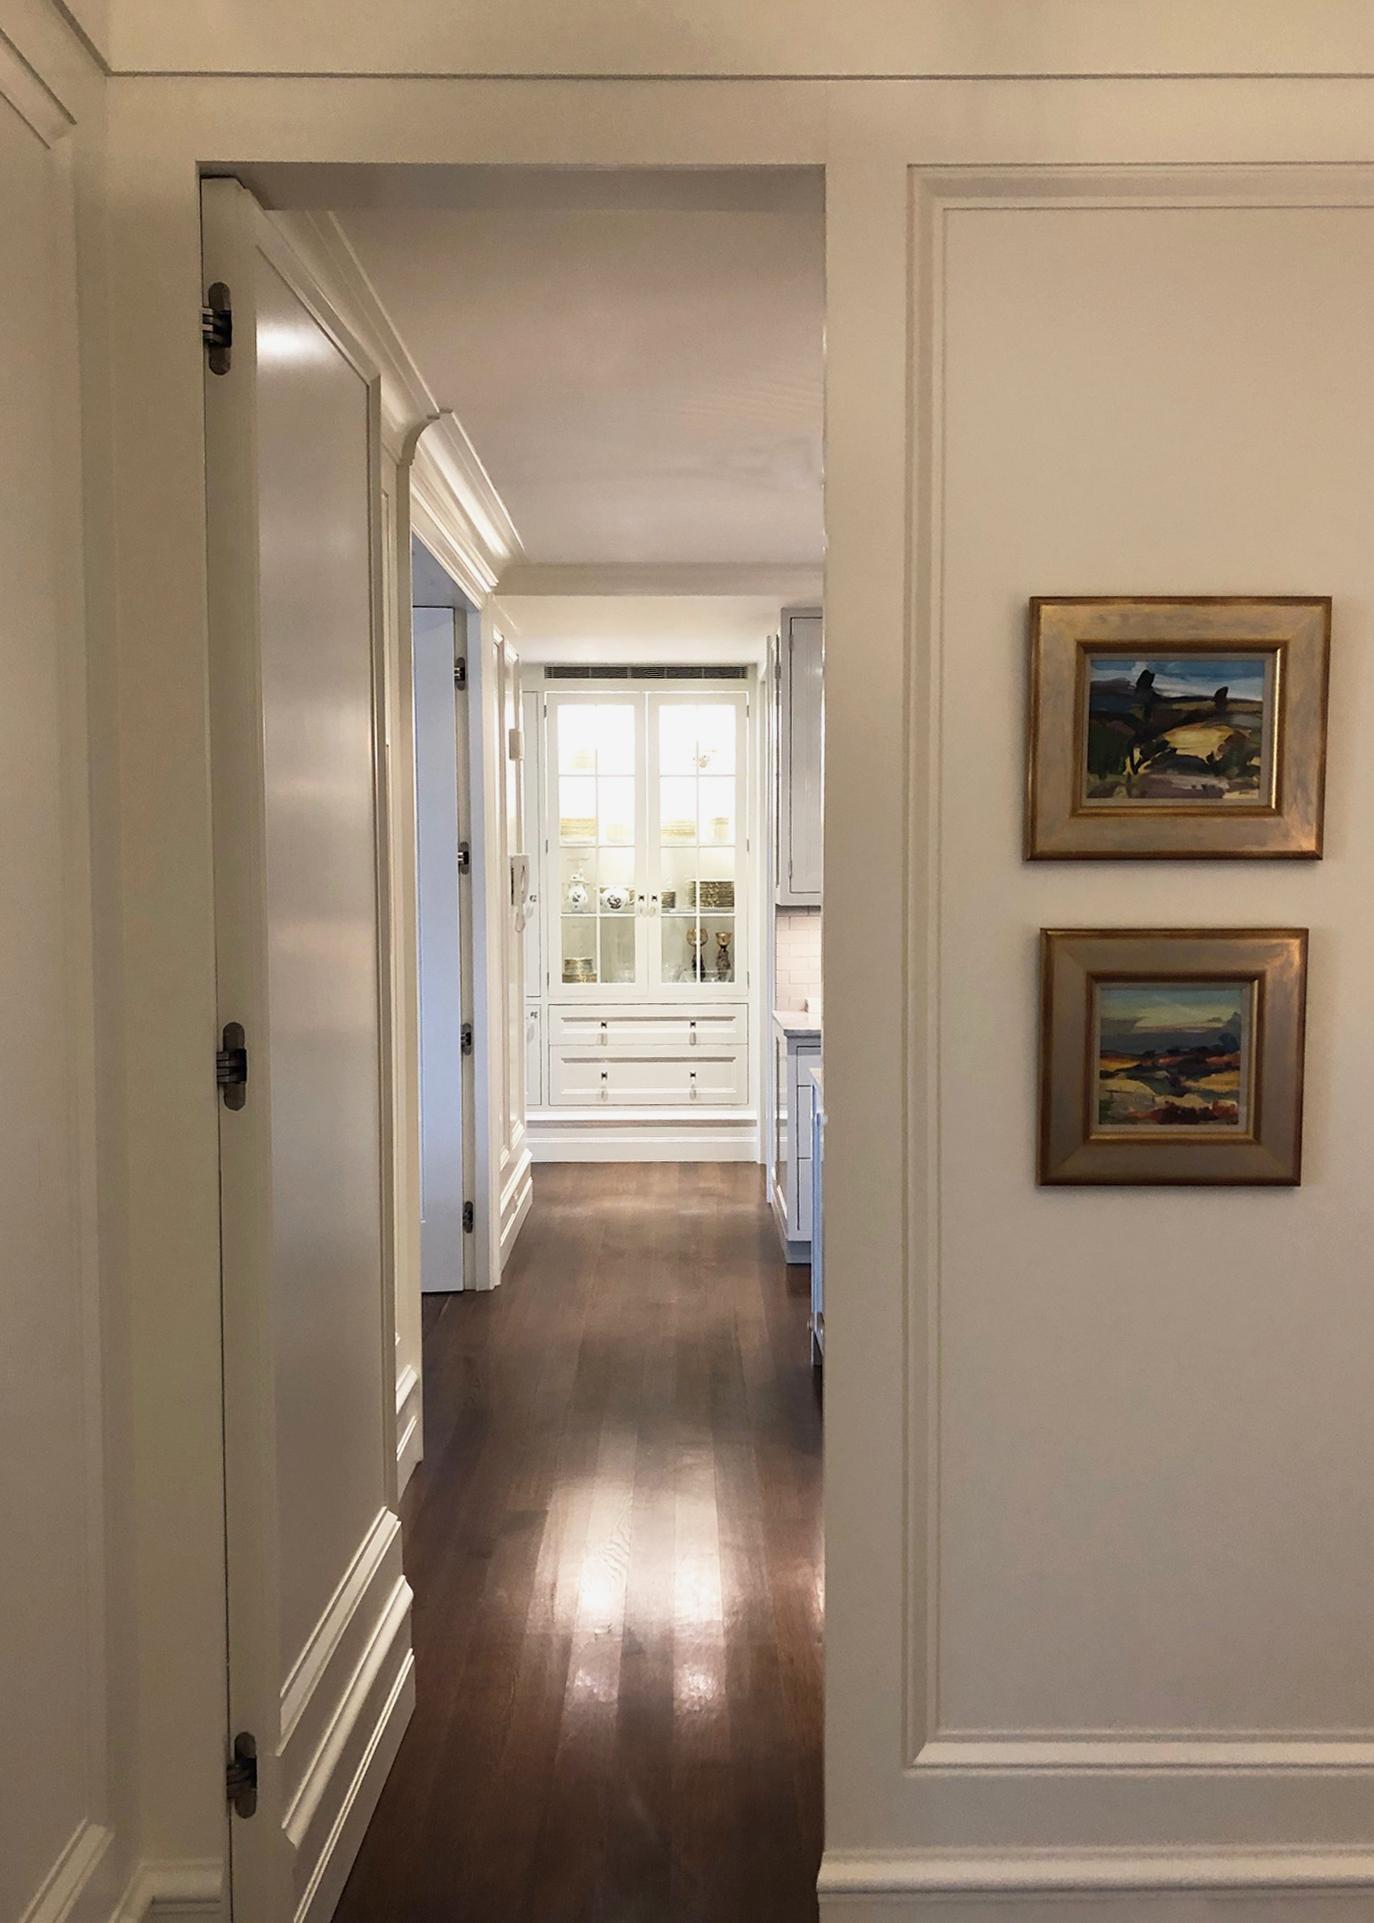 19 Entry to kitchen.jpg